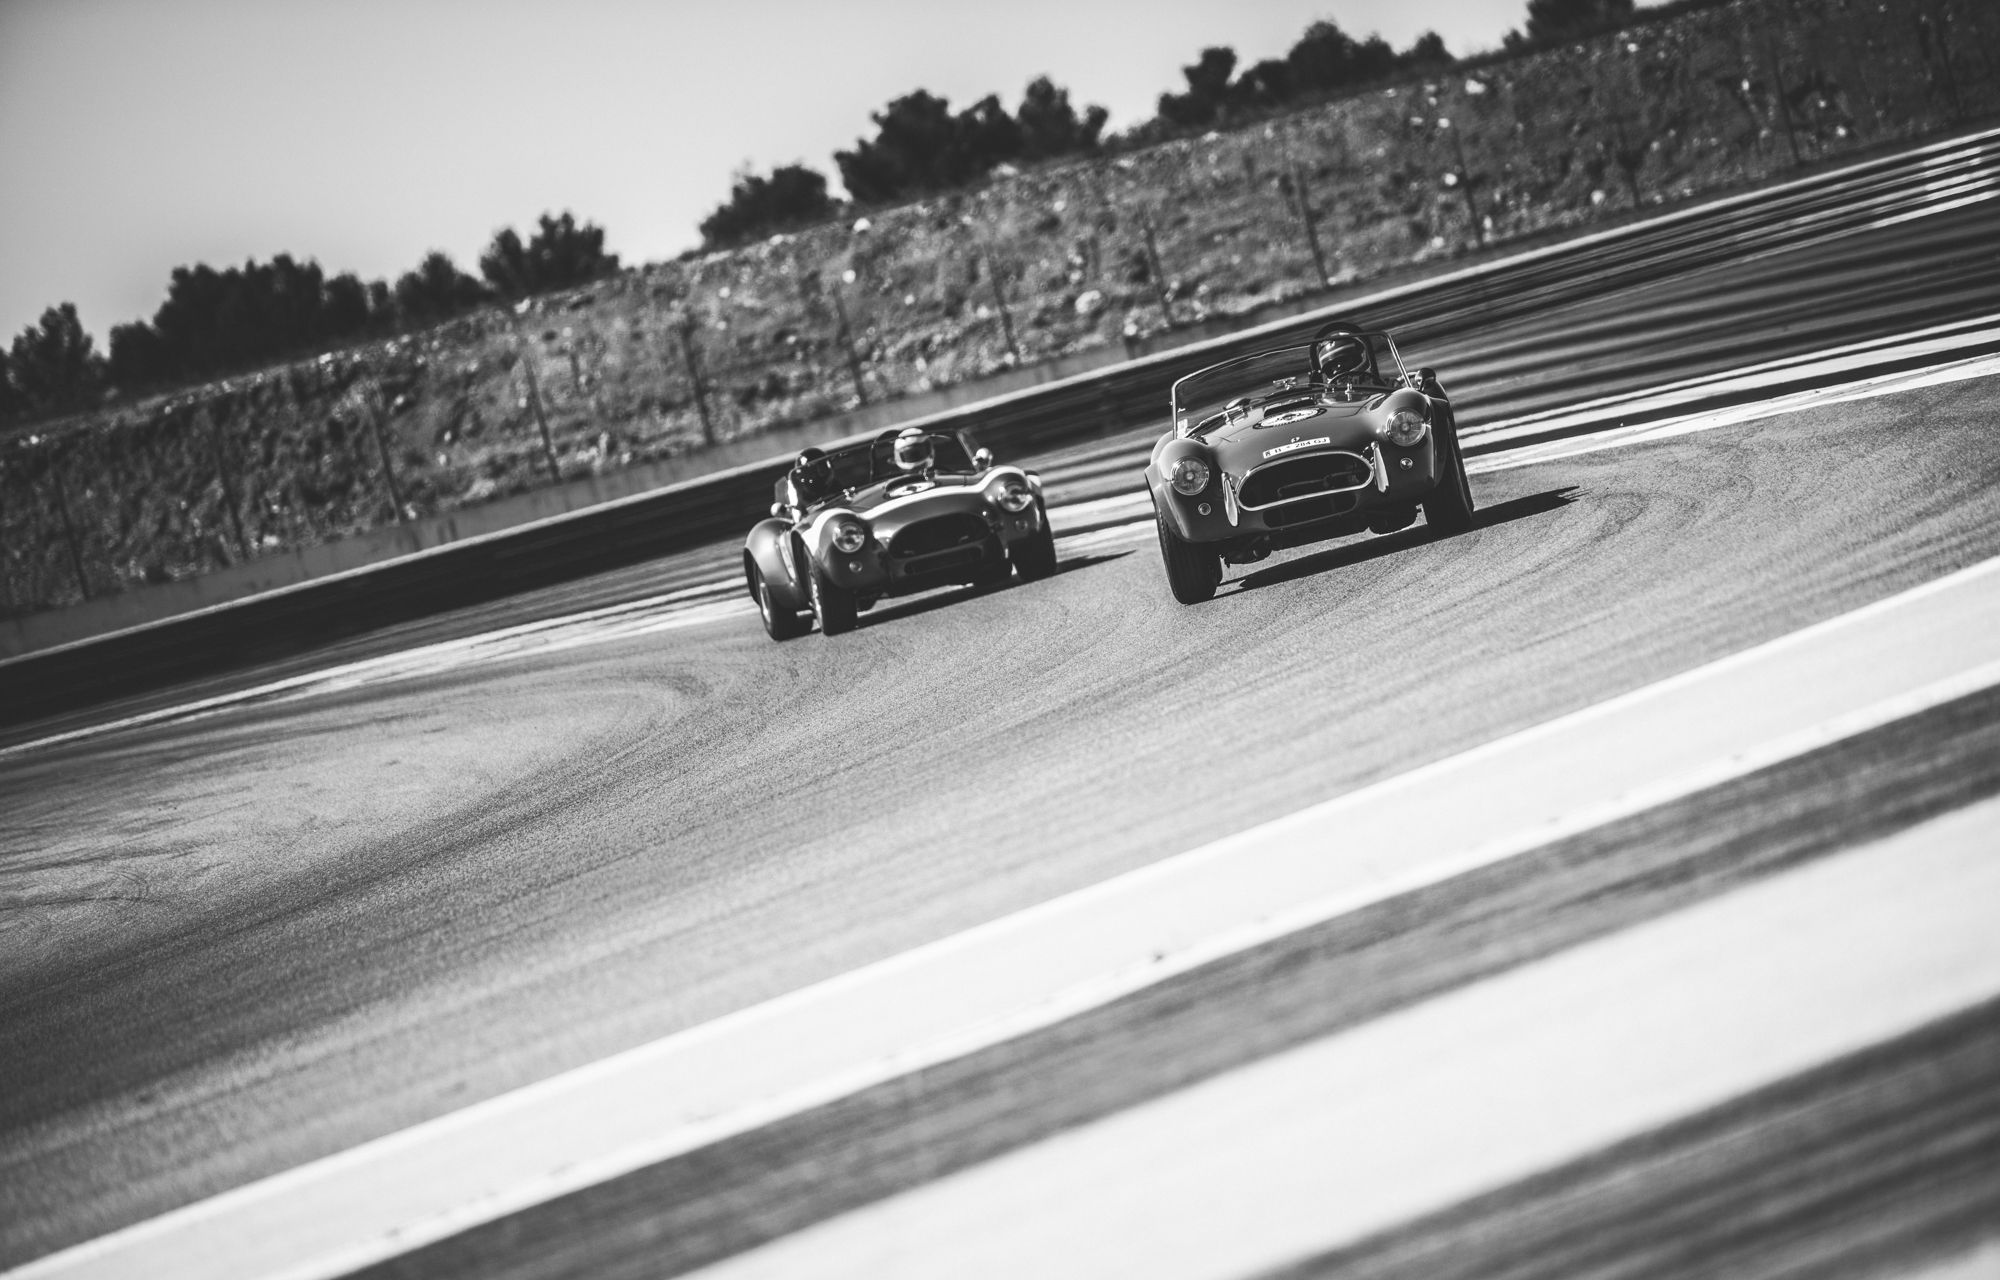 Baume & Mercier Shelby Only Event Le Castellet 2016